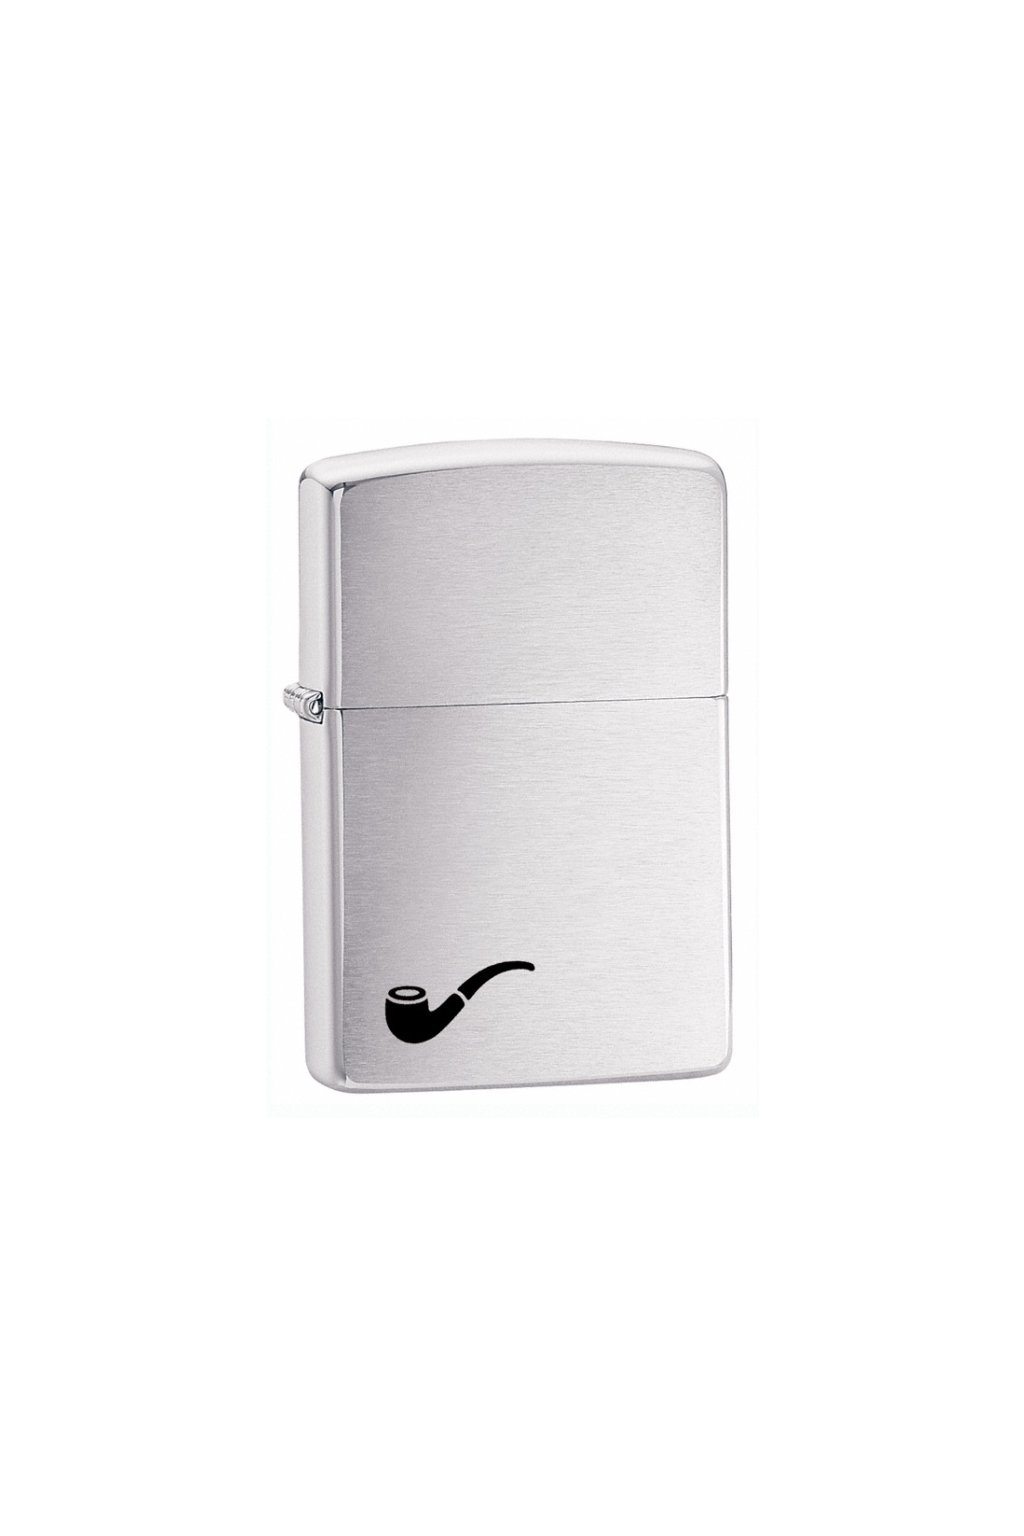 93116 zippo zapalovac 21770 pipe lighter